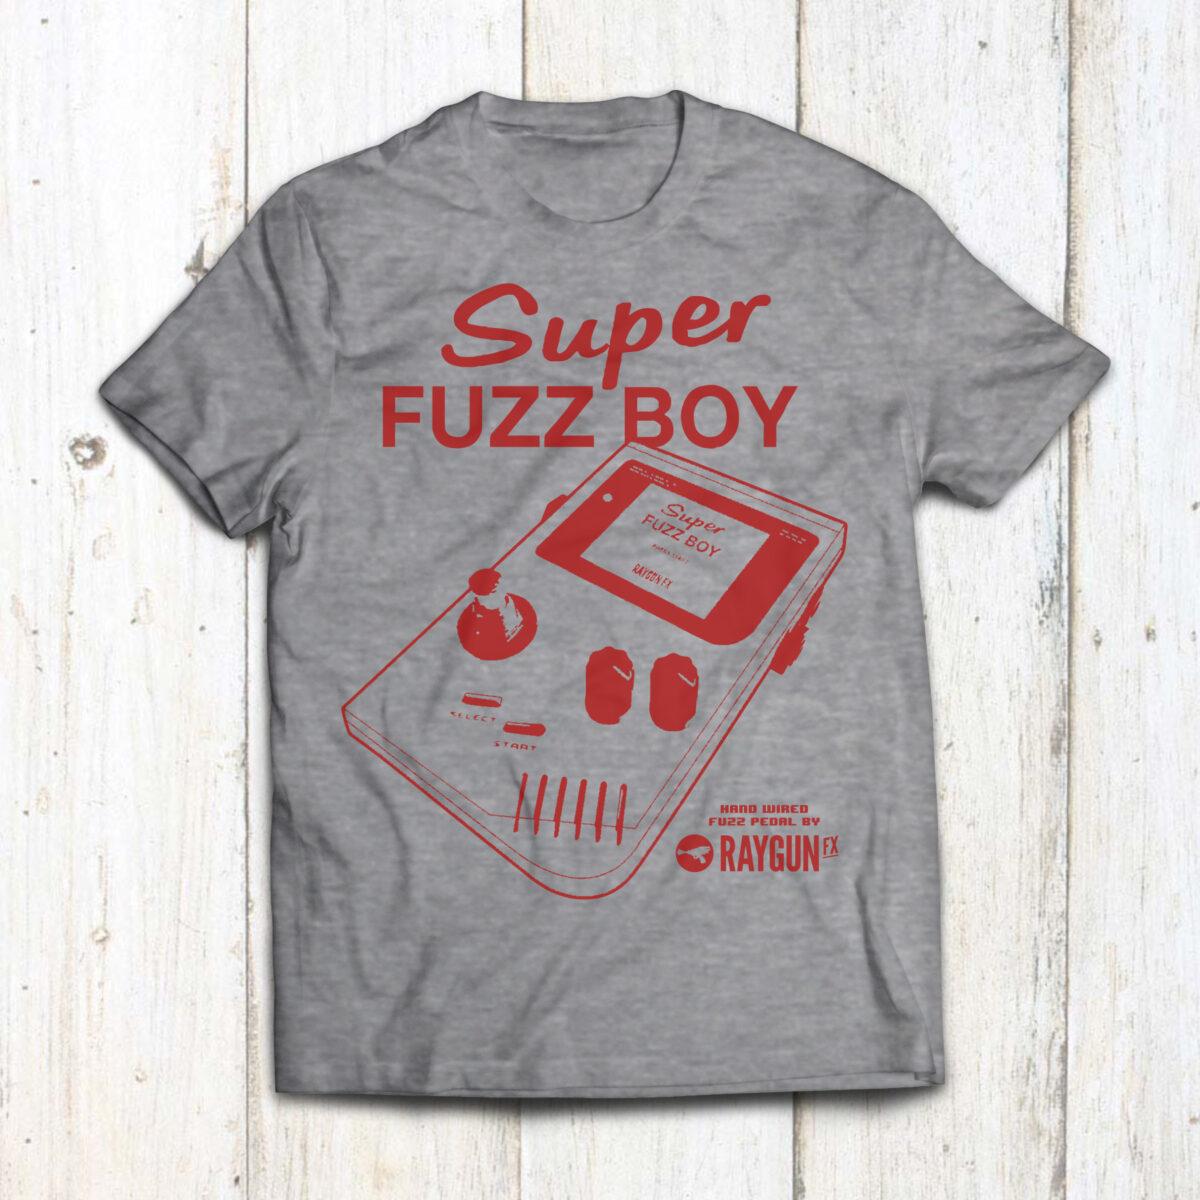 GameBoy-Tshirt-mock-up